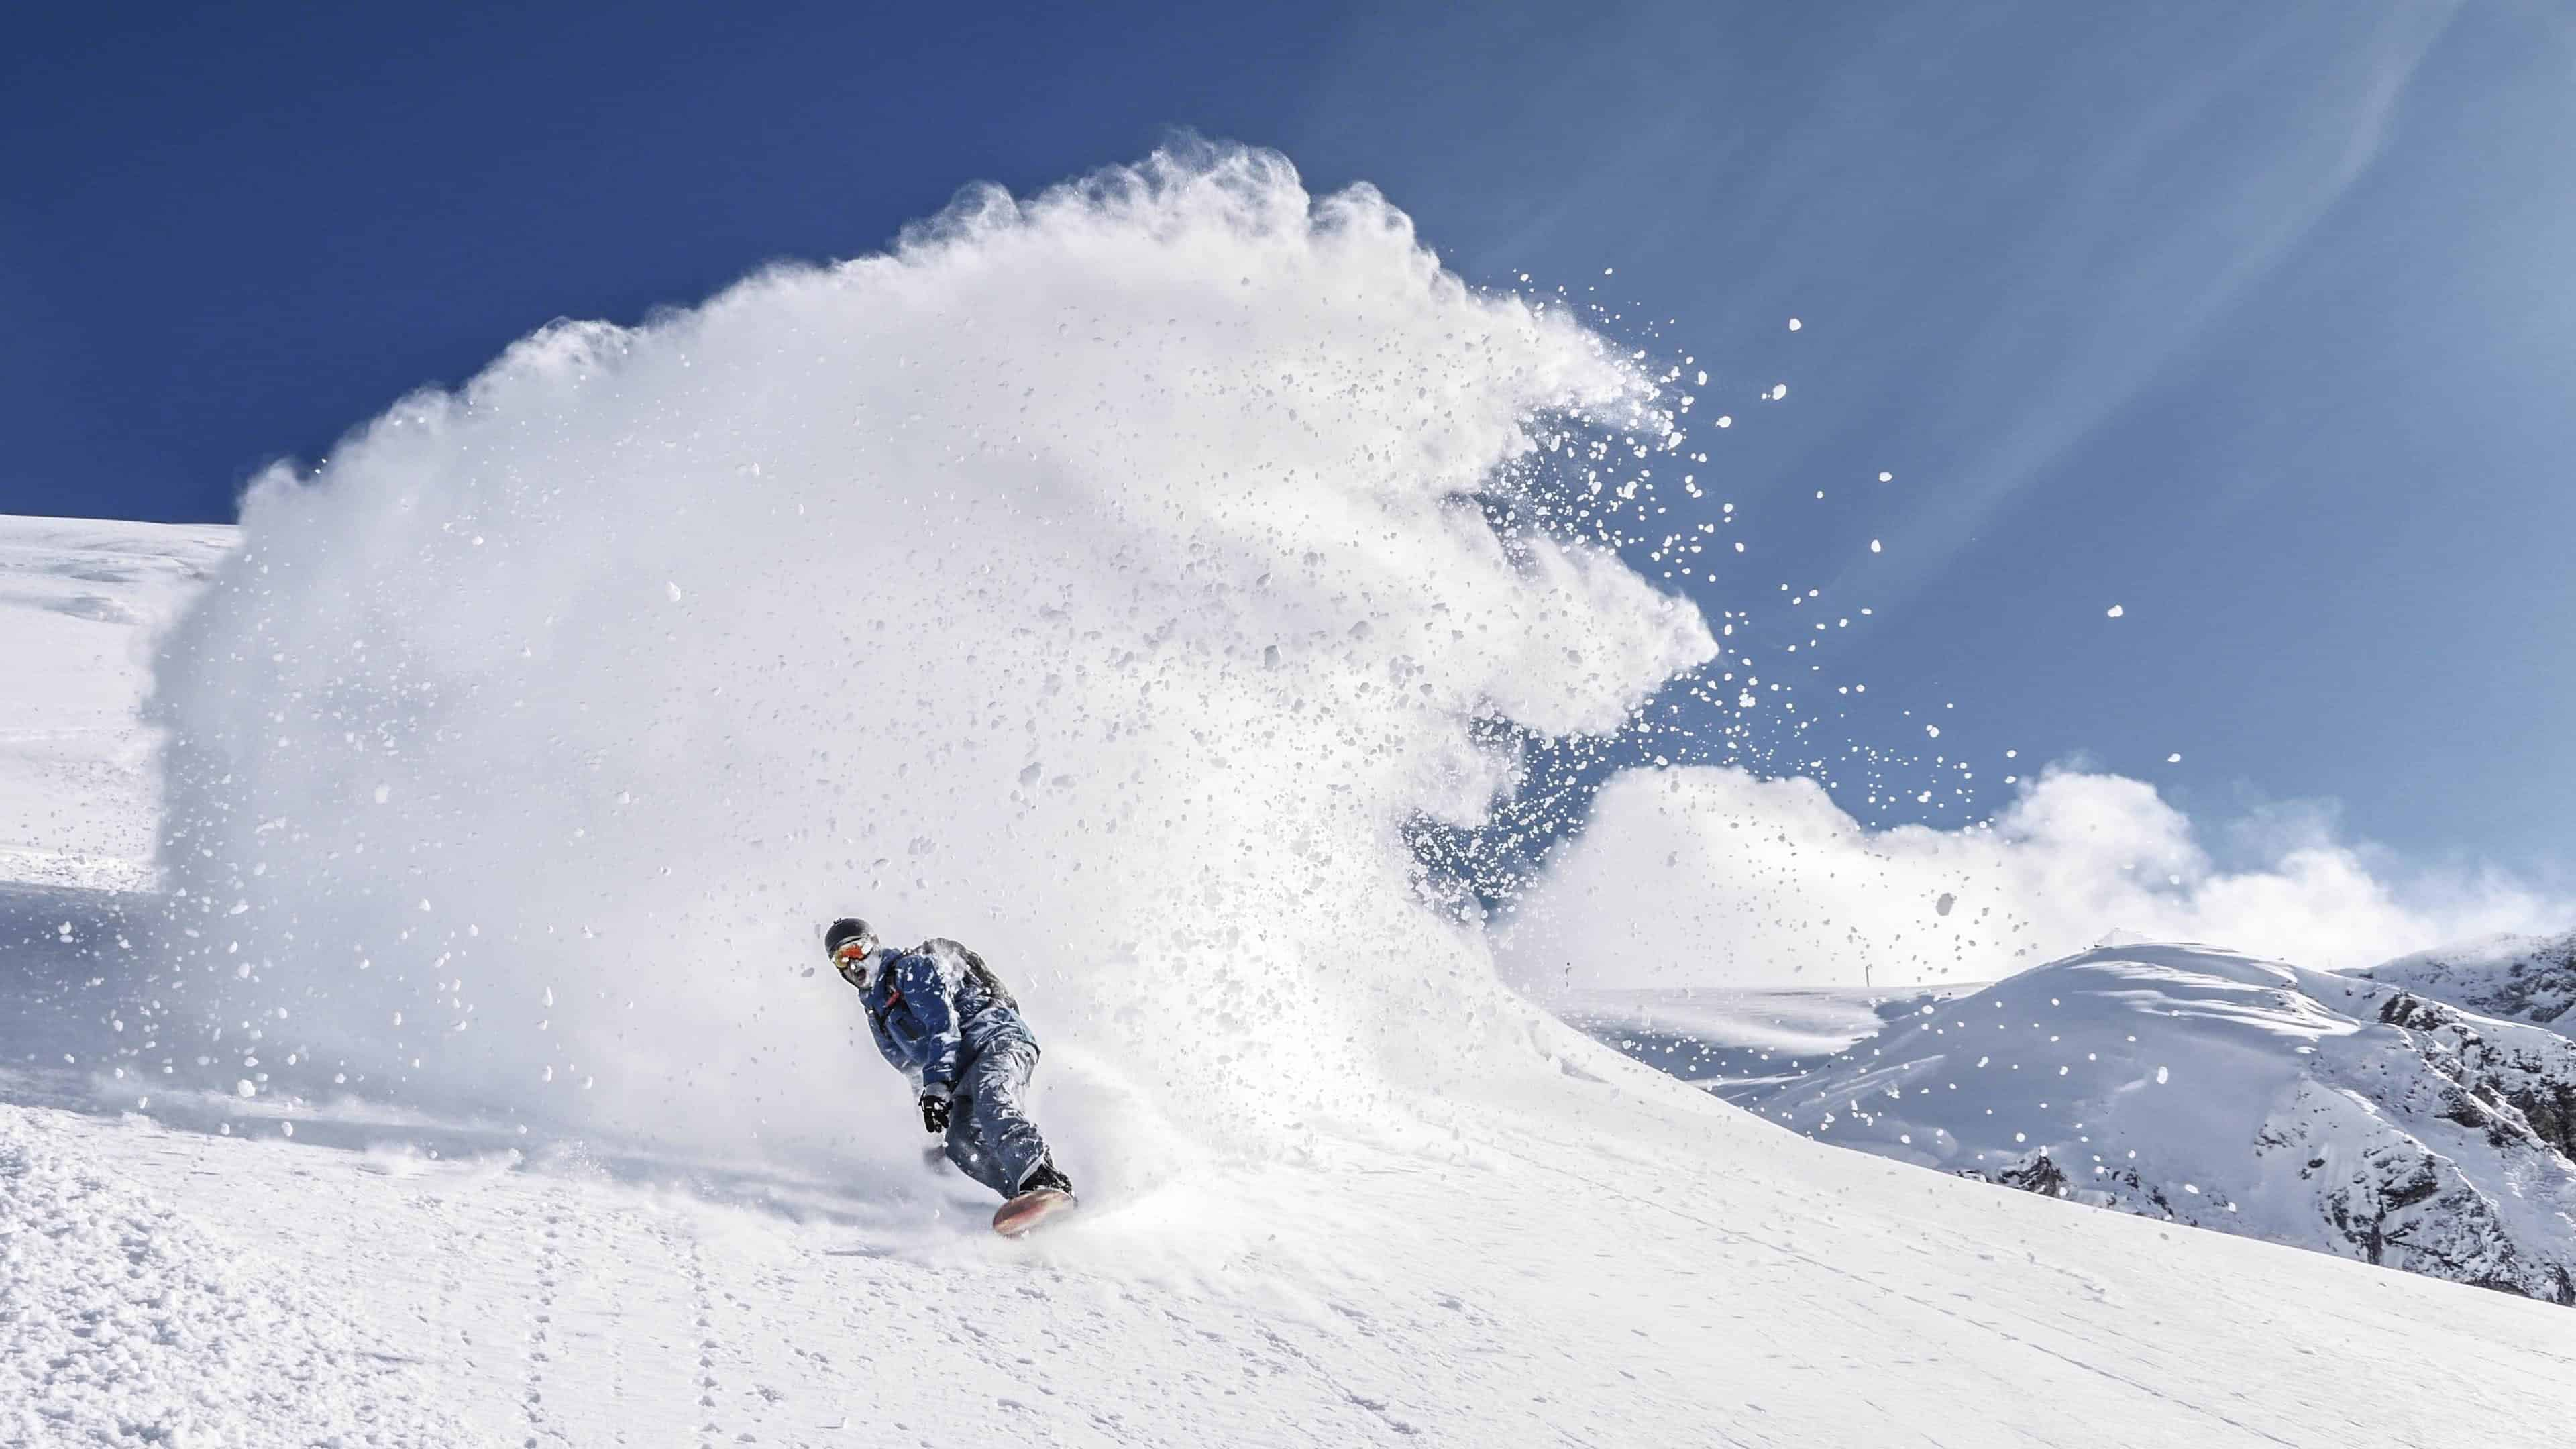 snowboarding in fresh powder uhd 4k wallpaper